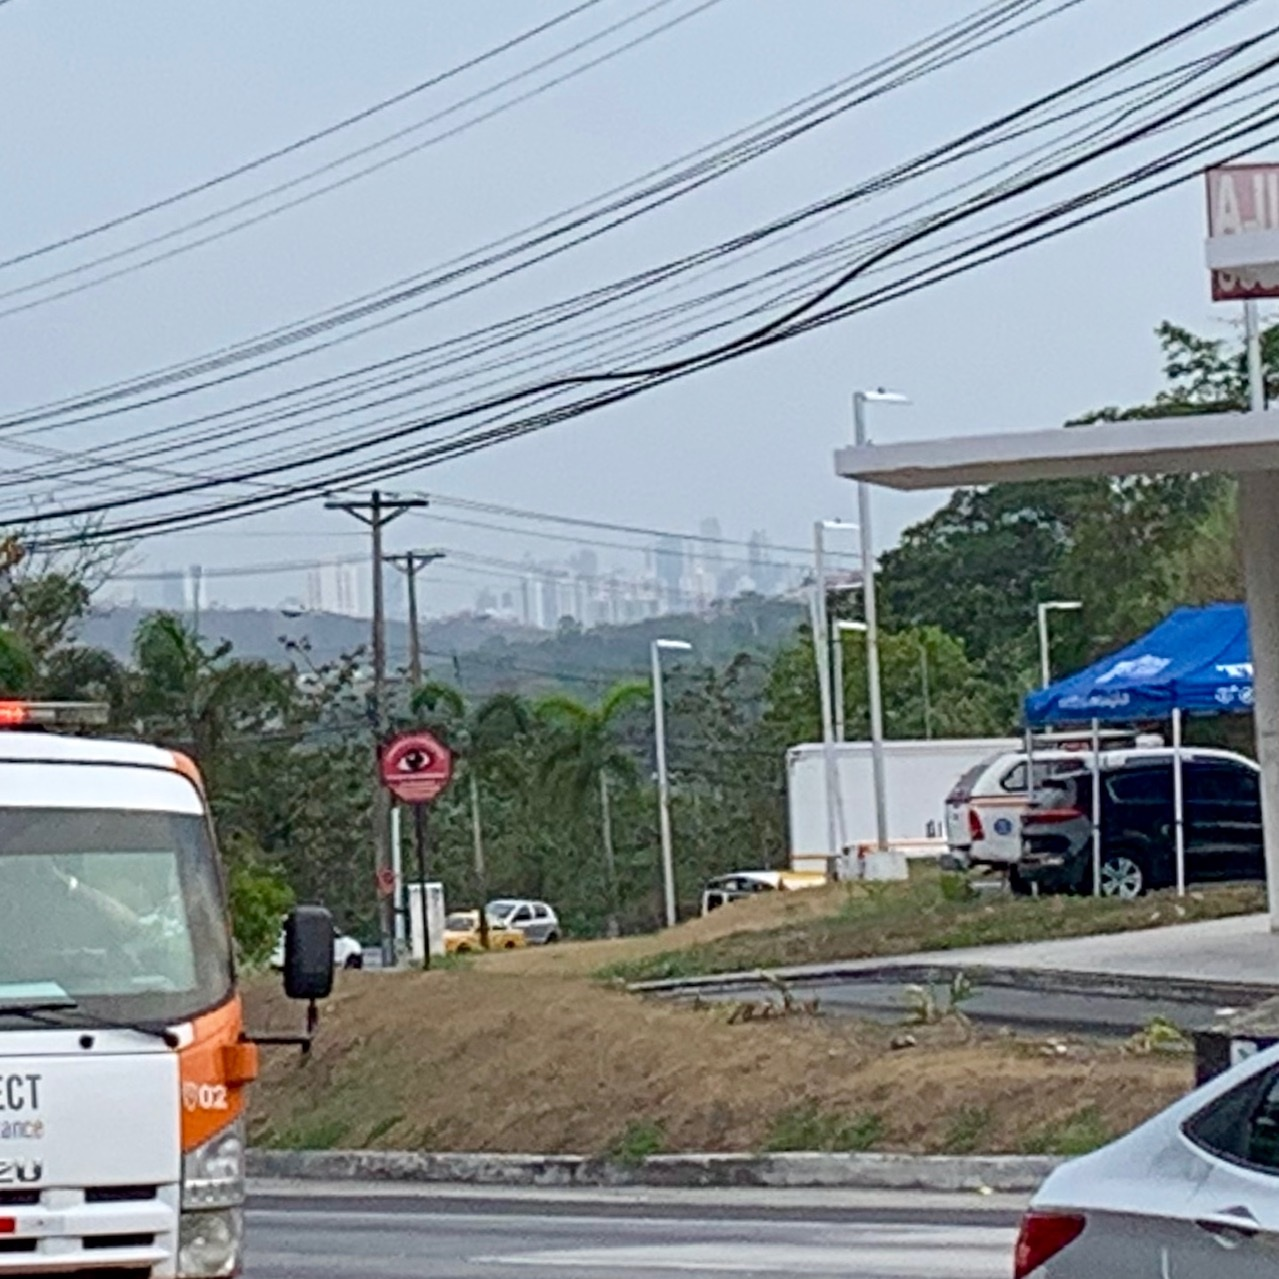 Panama+city+view.jpg